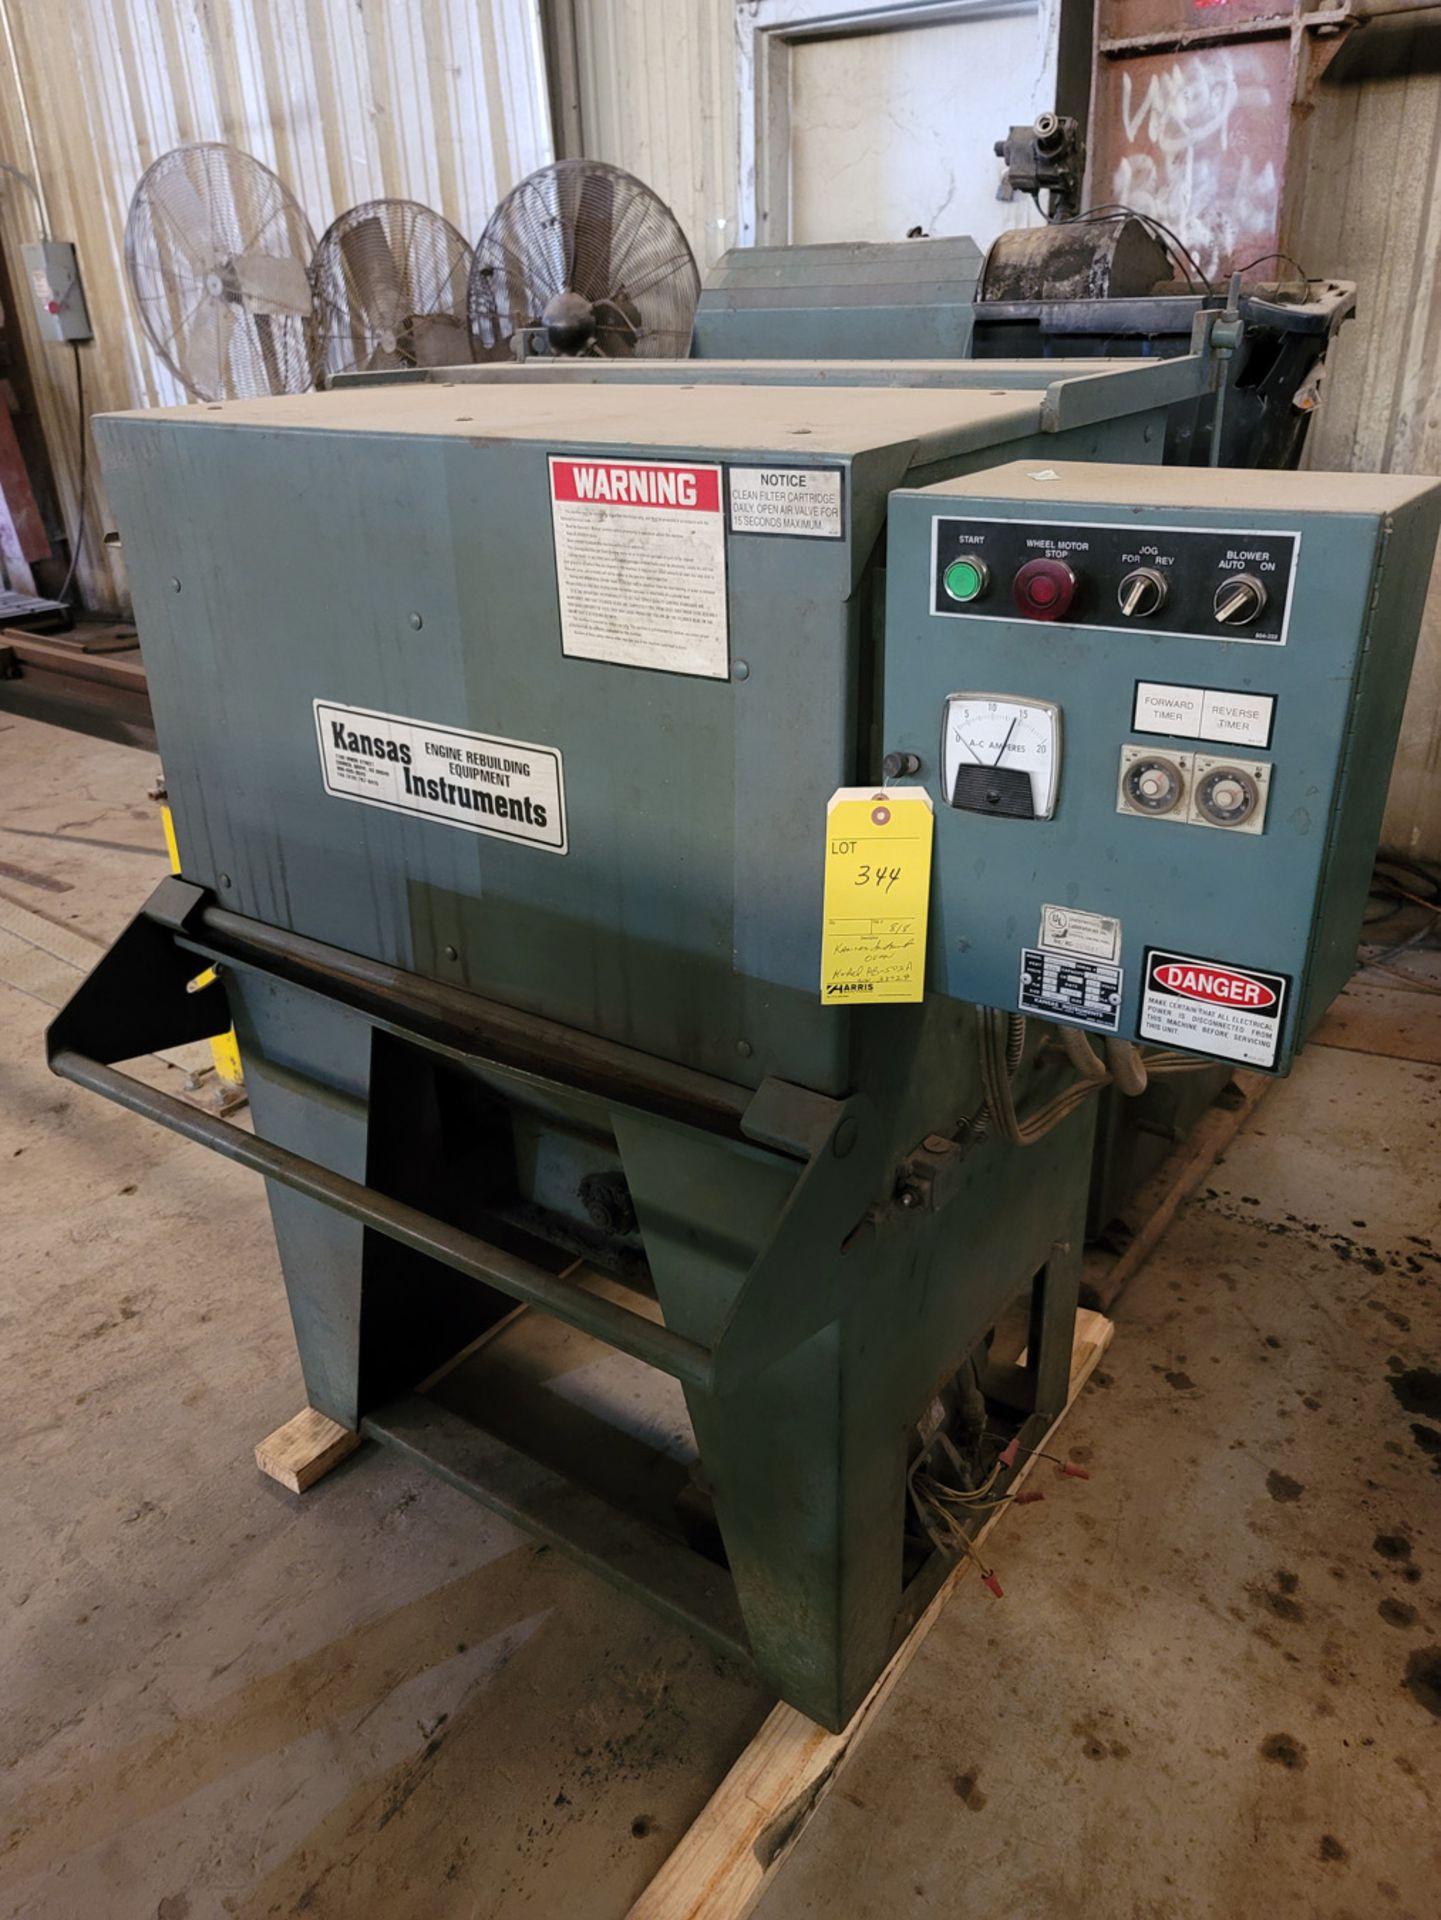 Kansas Instruments Model AB-502B Bake / Blast / Tumble Machine